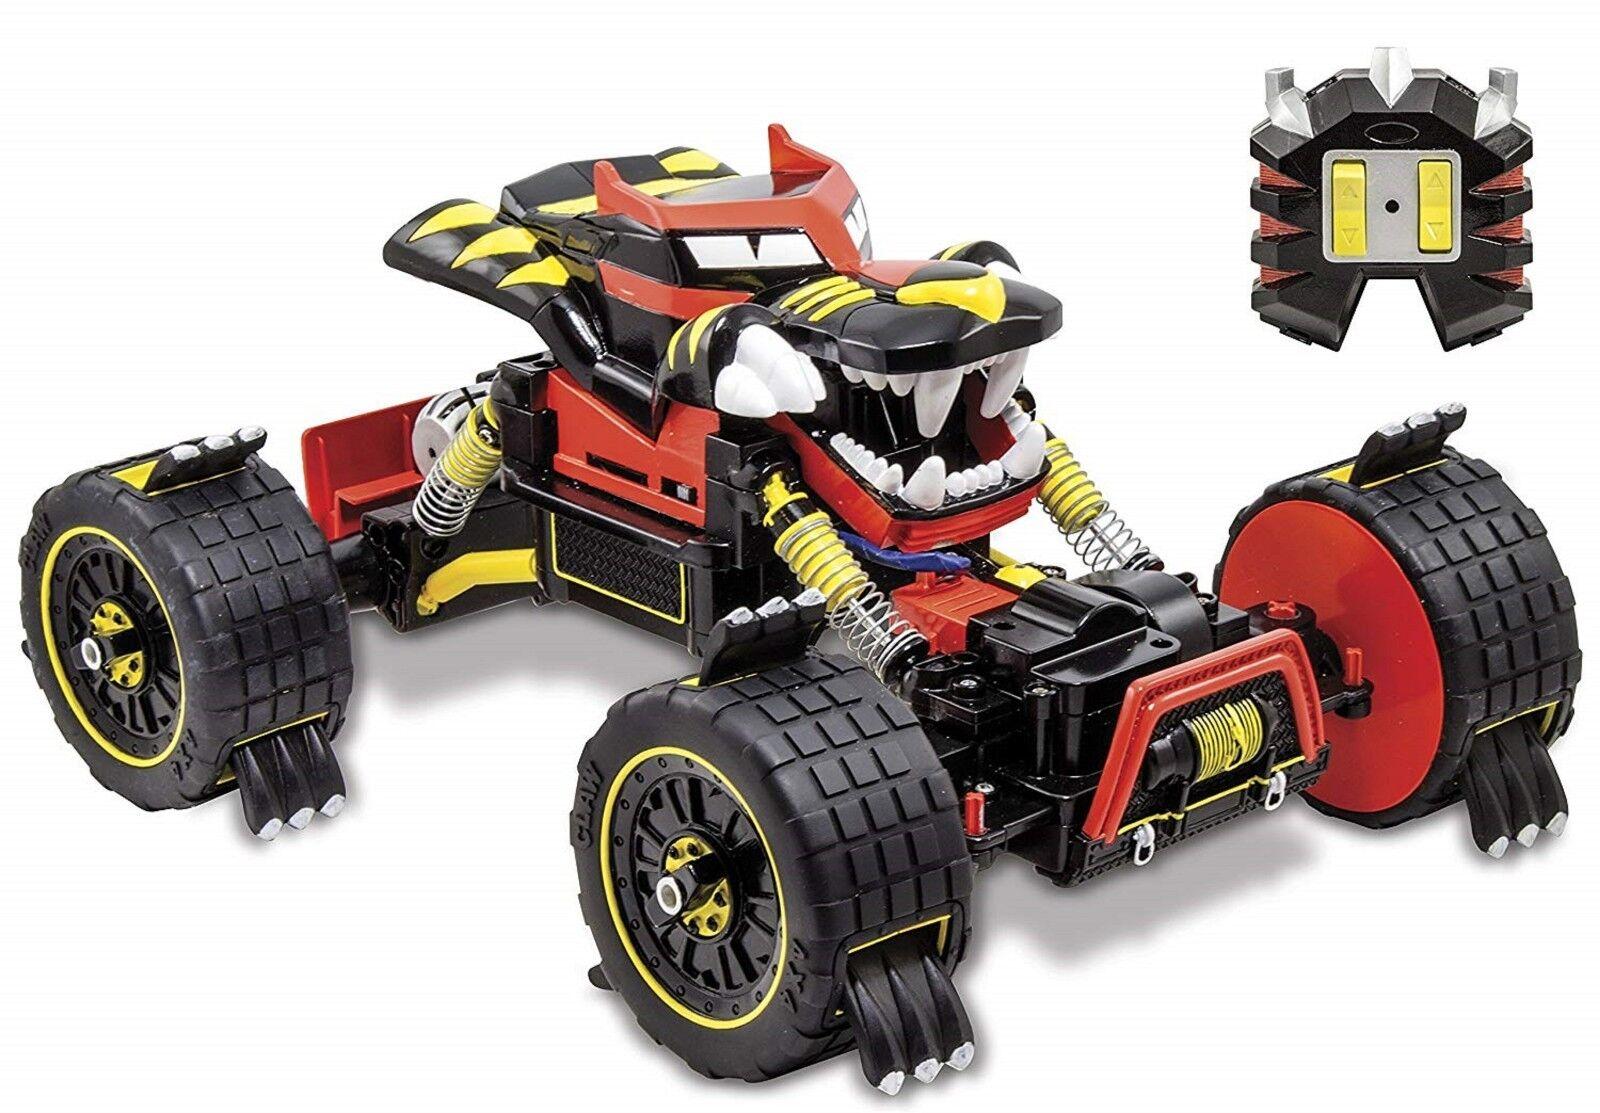 Kid Galaxy RC Off Road Car Claw Climber Tiger 4x4 Remote Control Car Ages 5+